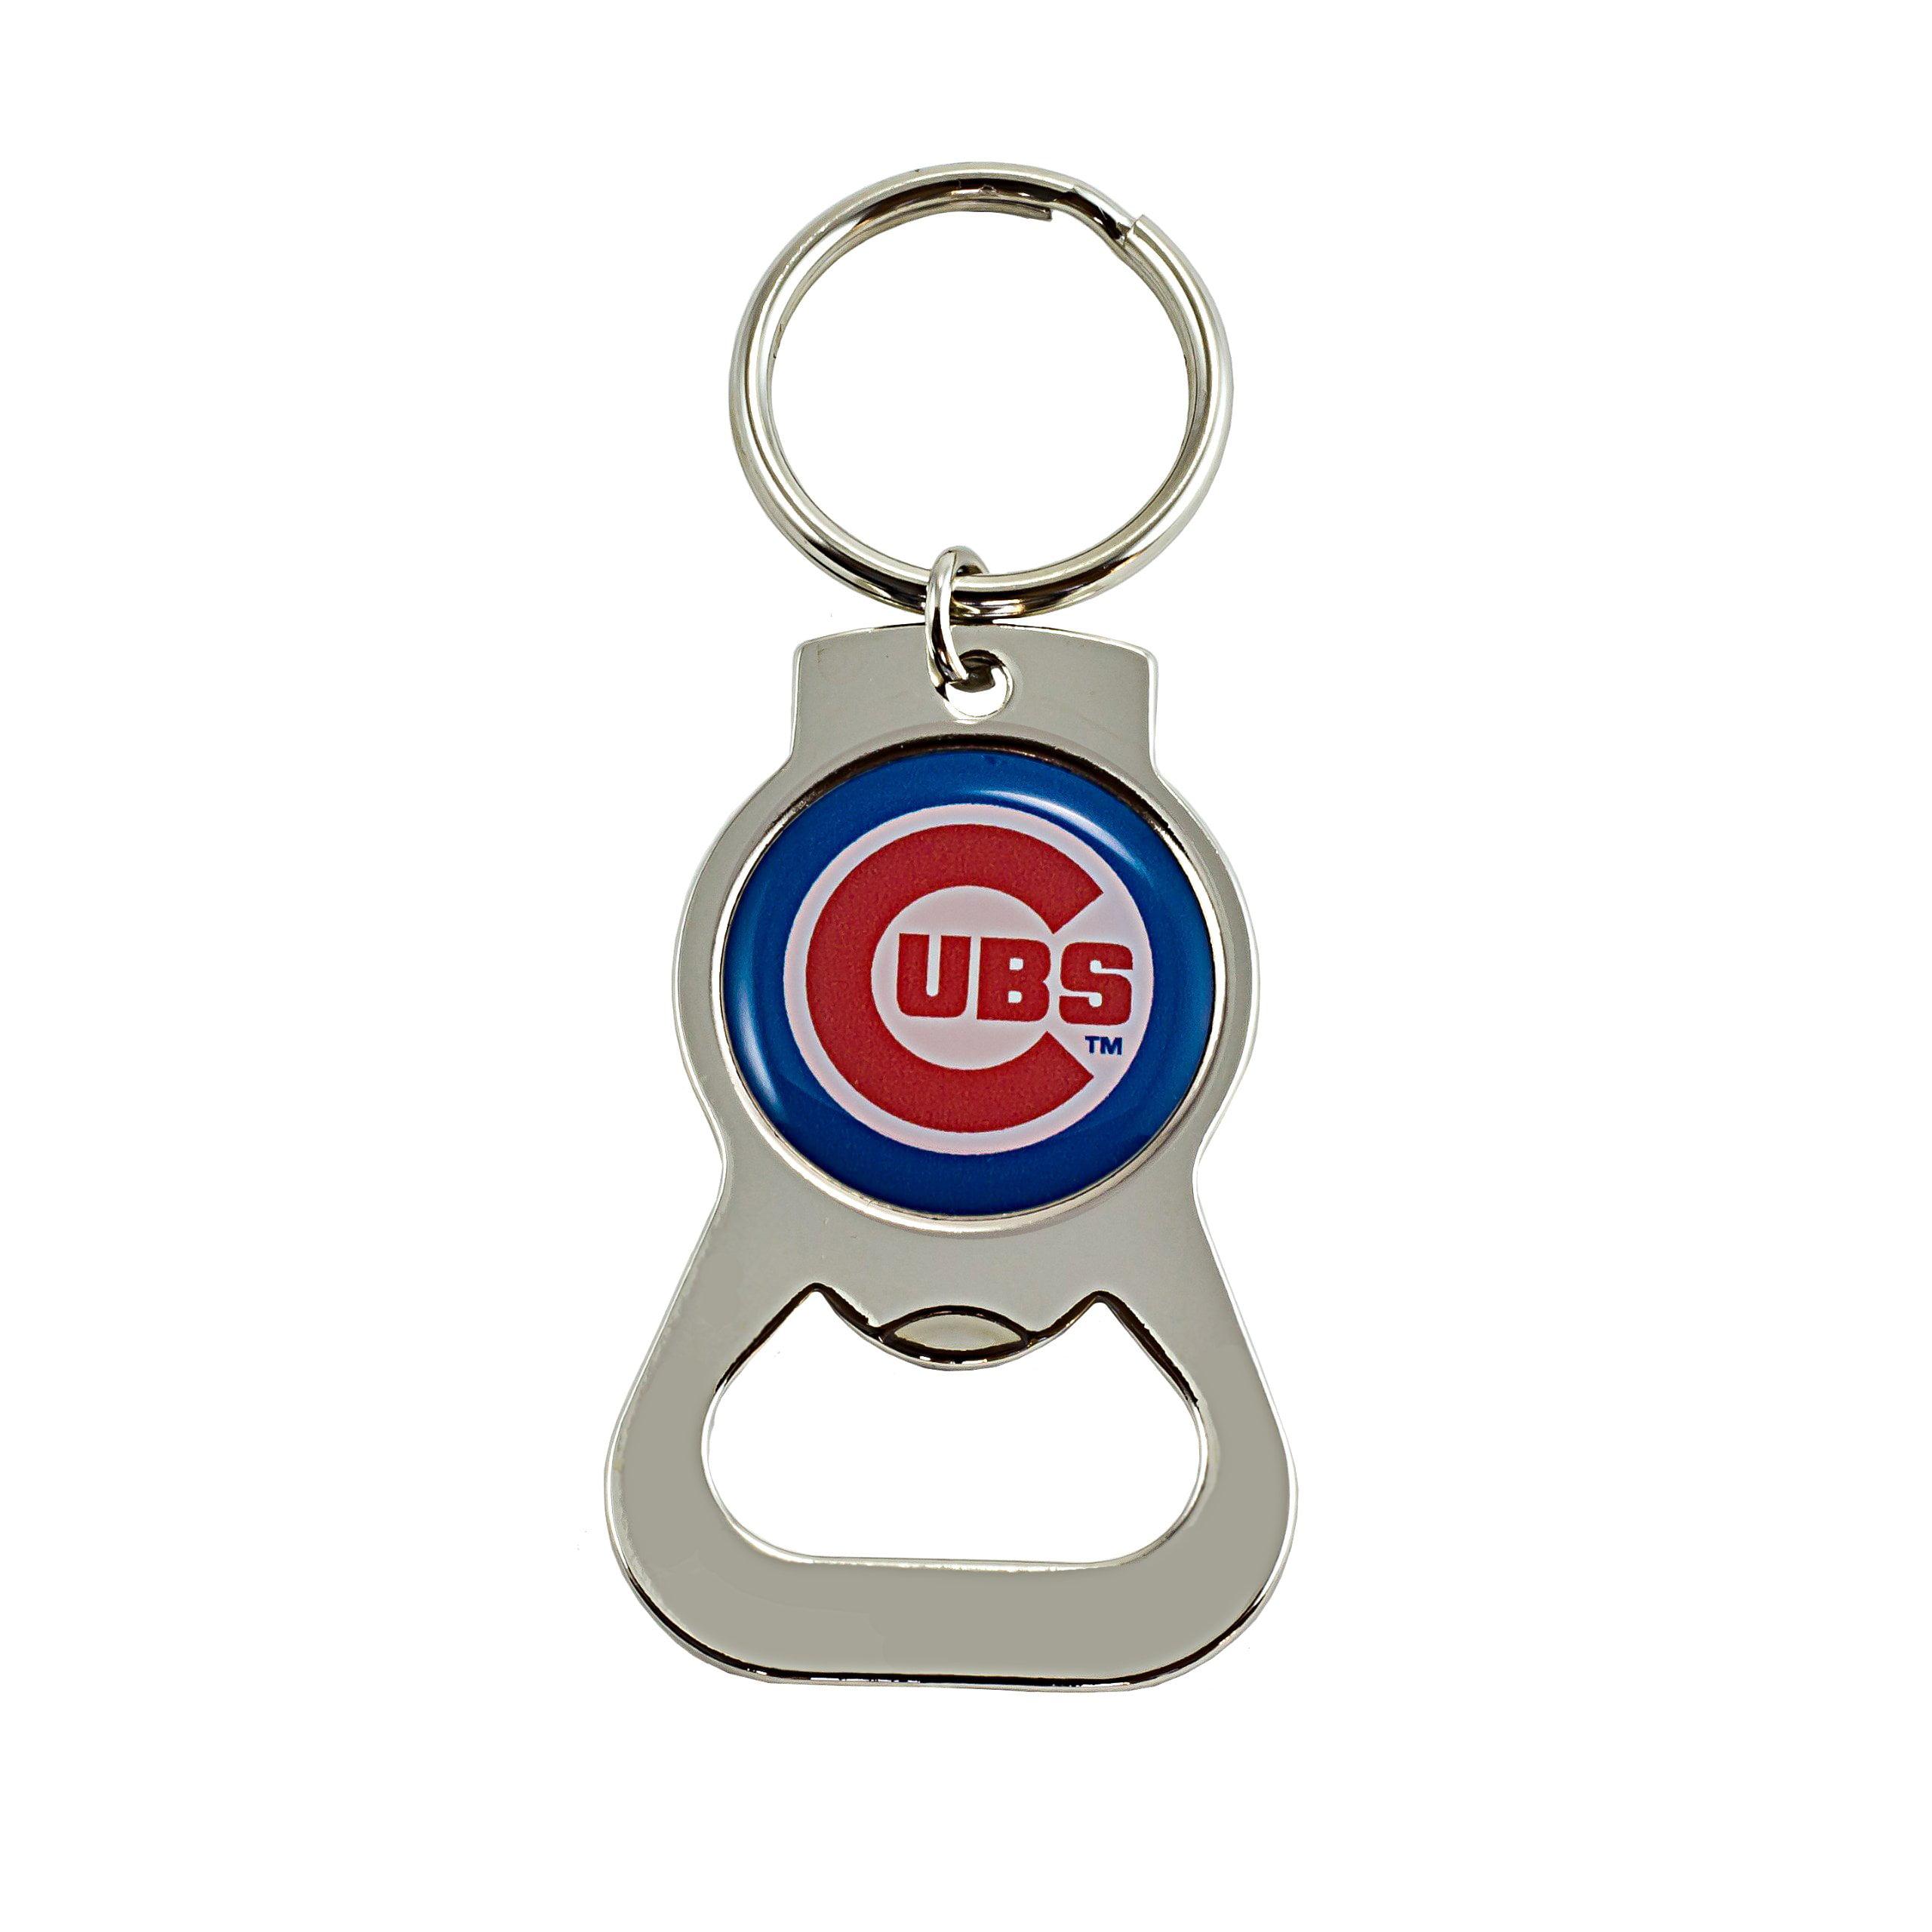 Chicago Cubs Bottle Opener Keychain (AM)